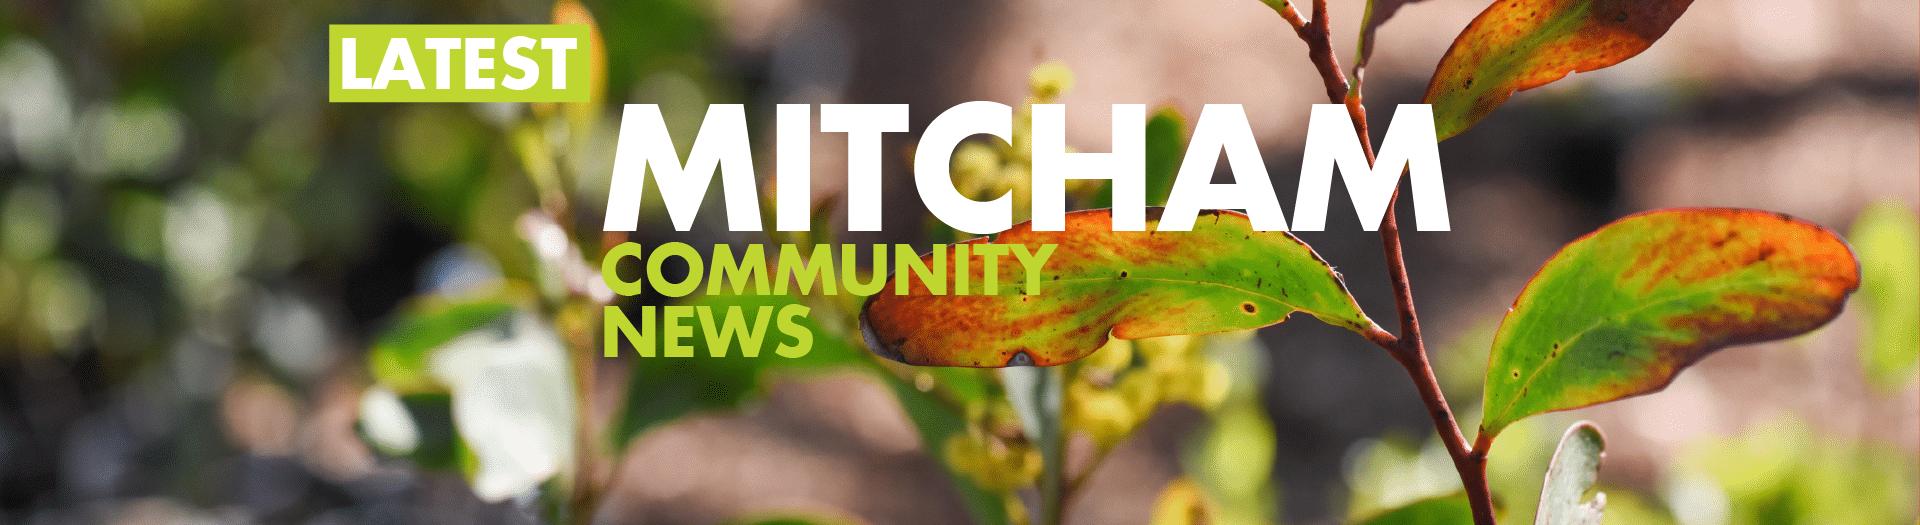 Latest Mitcham Community News Scrolling Banner